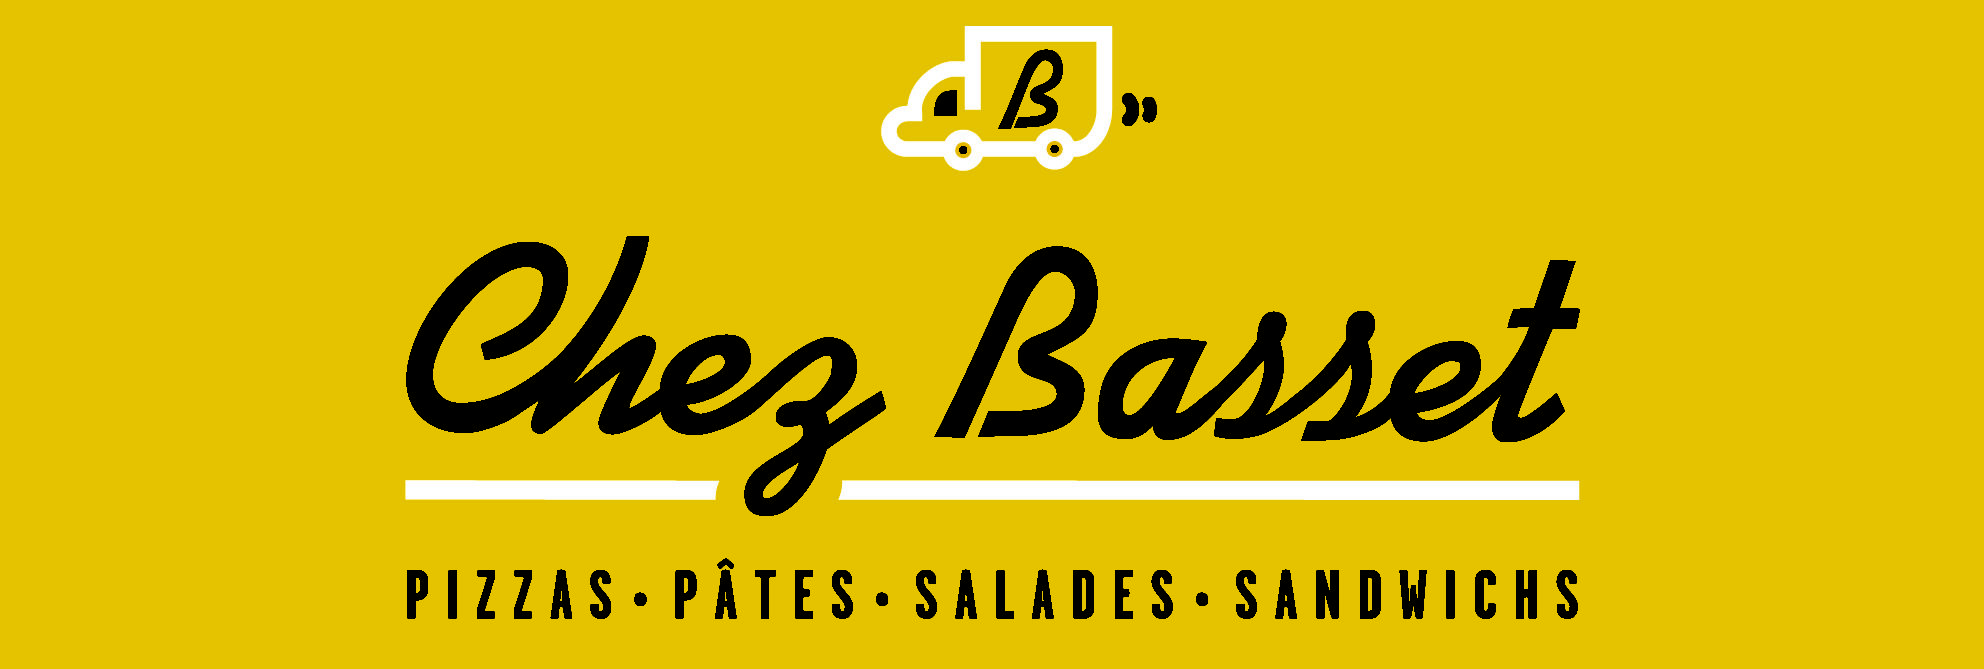 Chez Basset